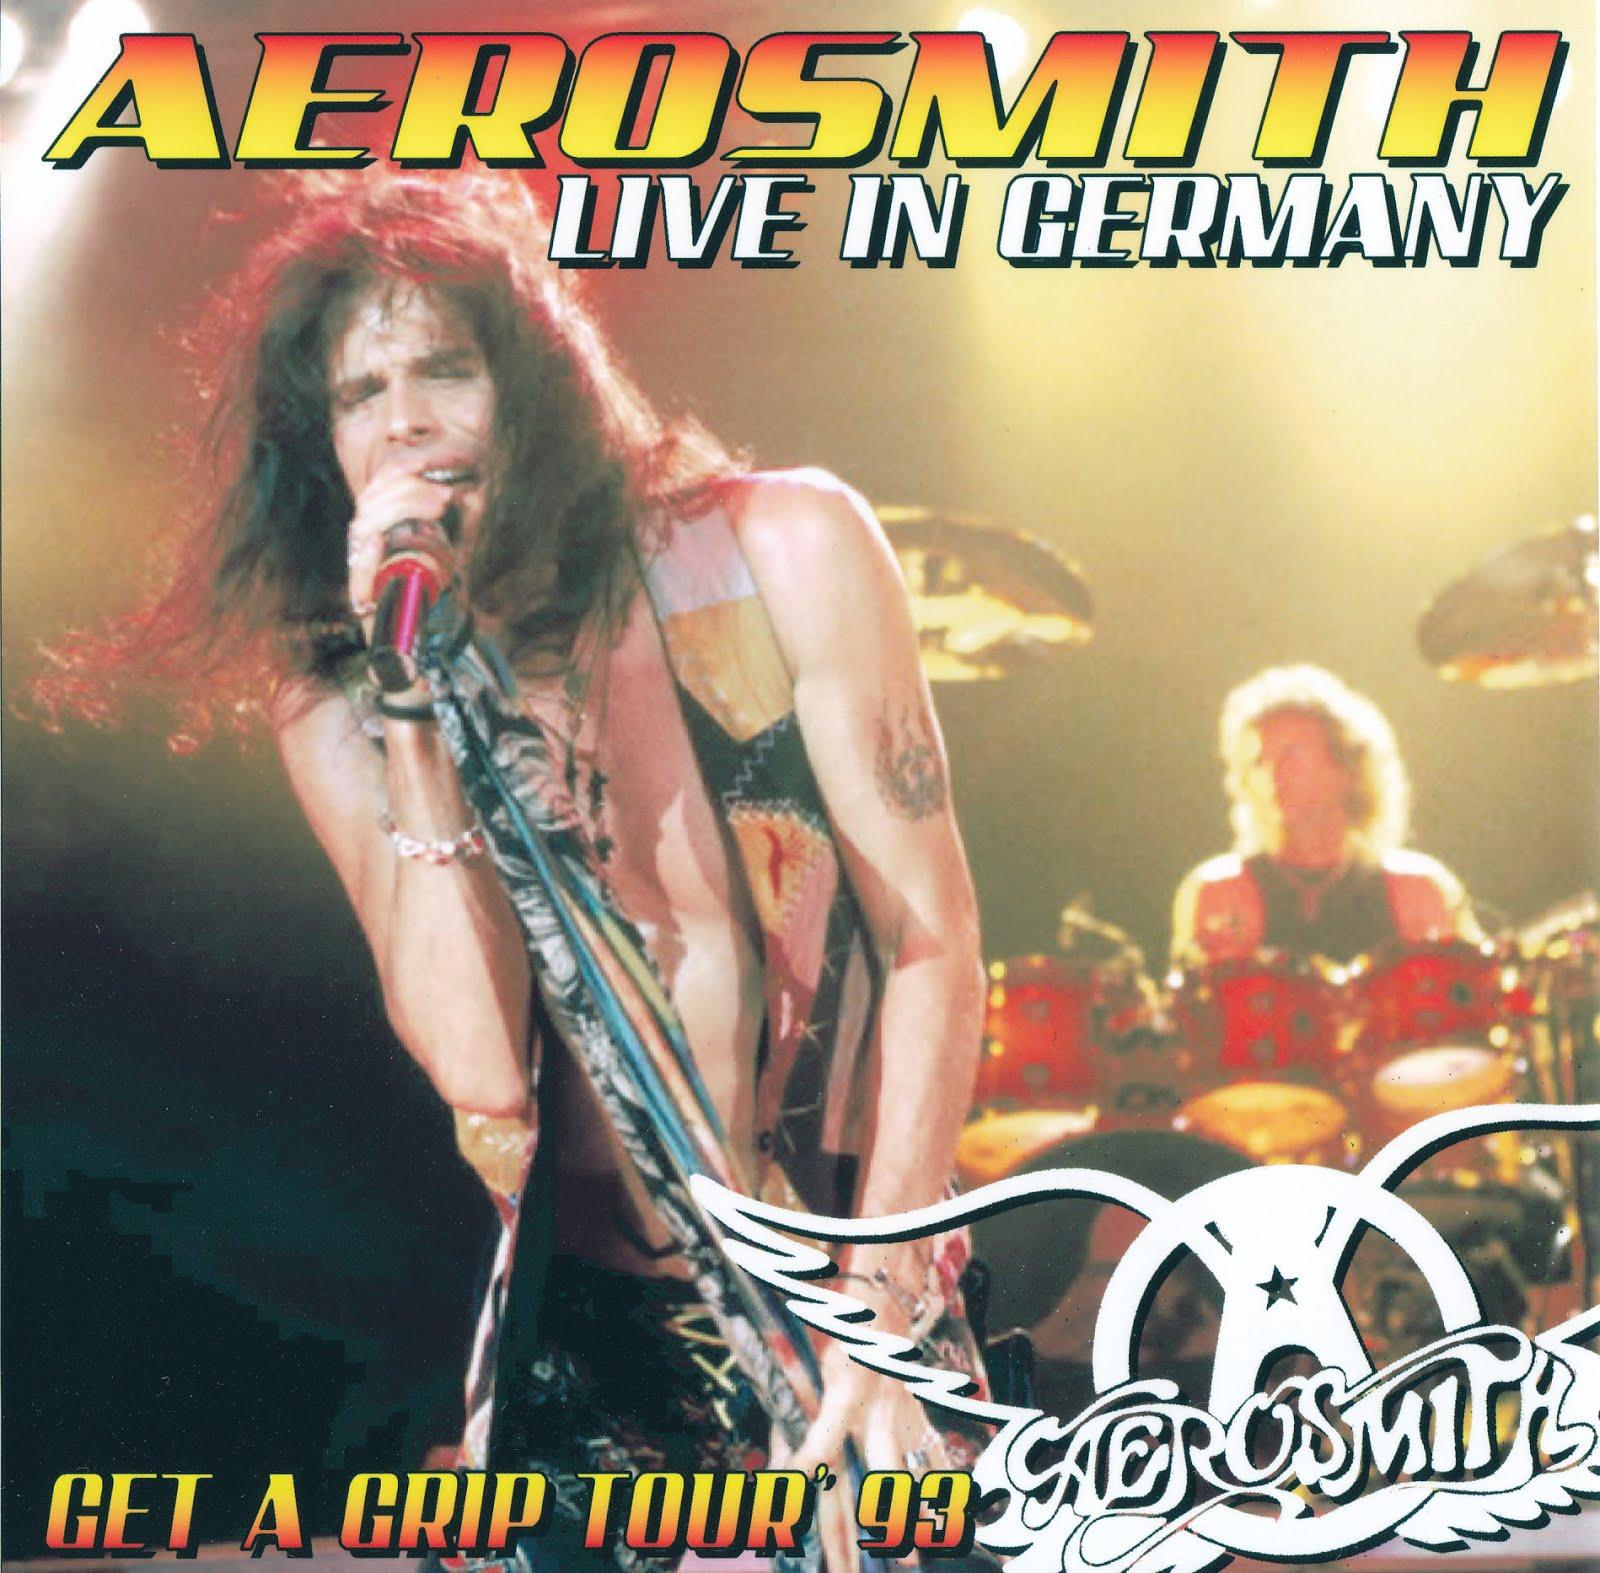 Aerosmith Bootlegs Cover Arts Live In Germany Oldenburg